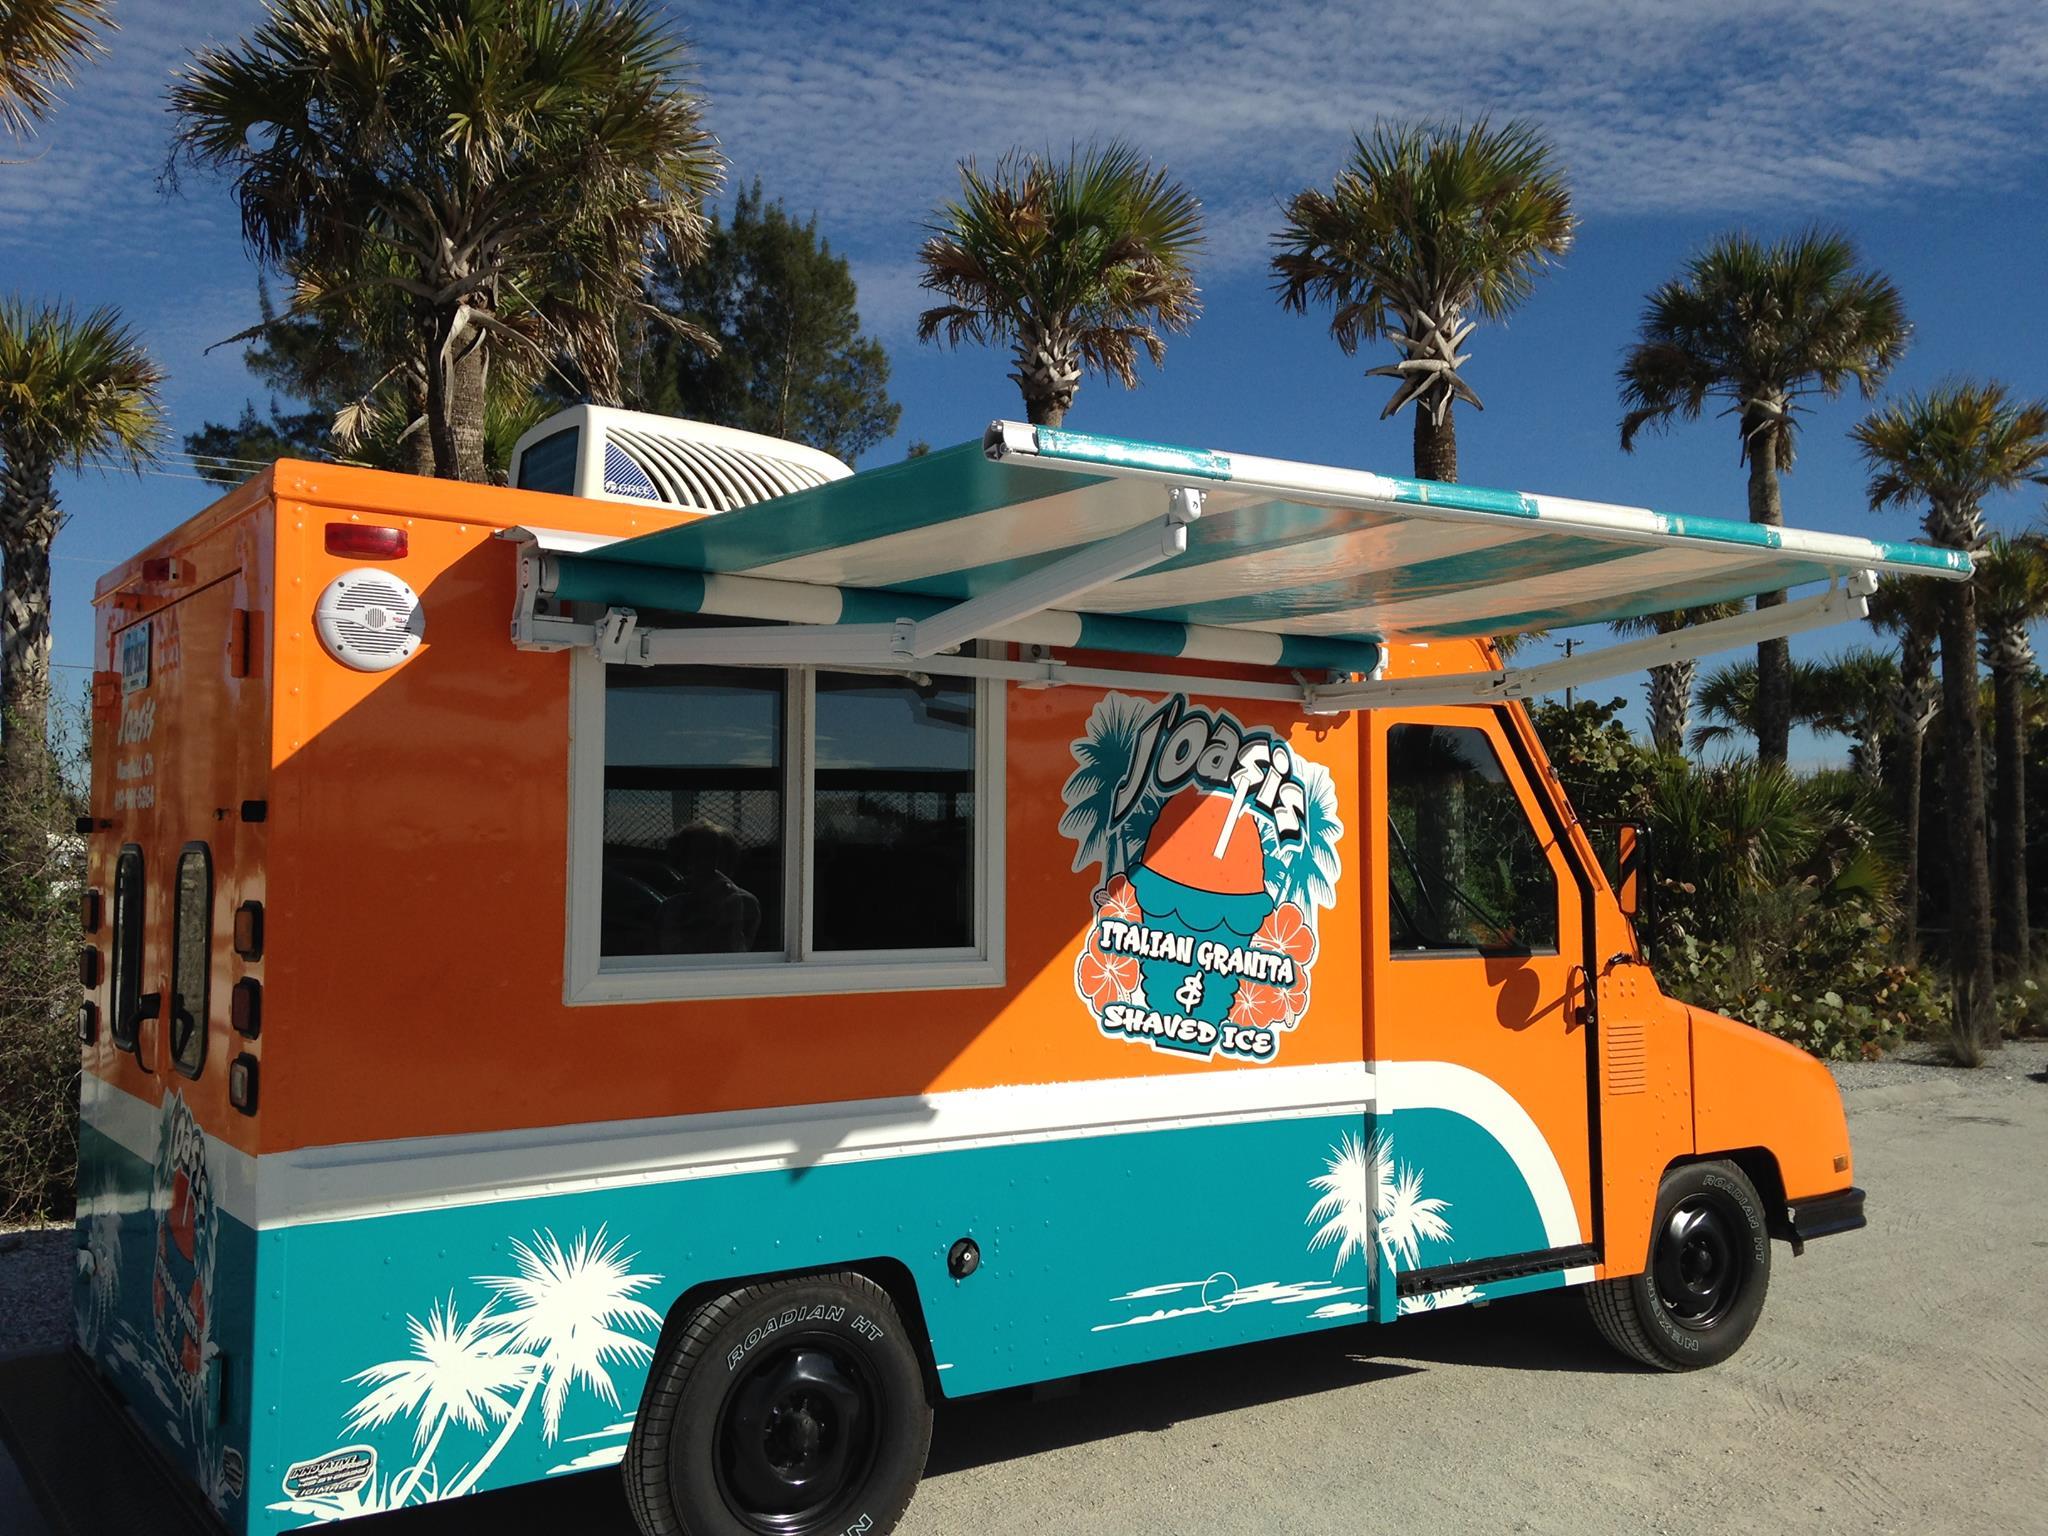 J'Oasis Italian Granita & Island Shave Ice Food Truck